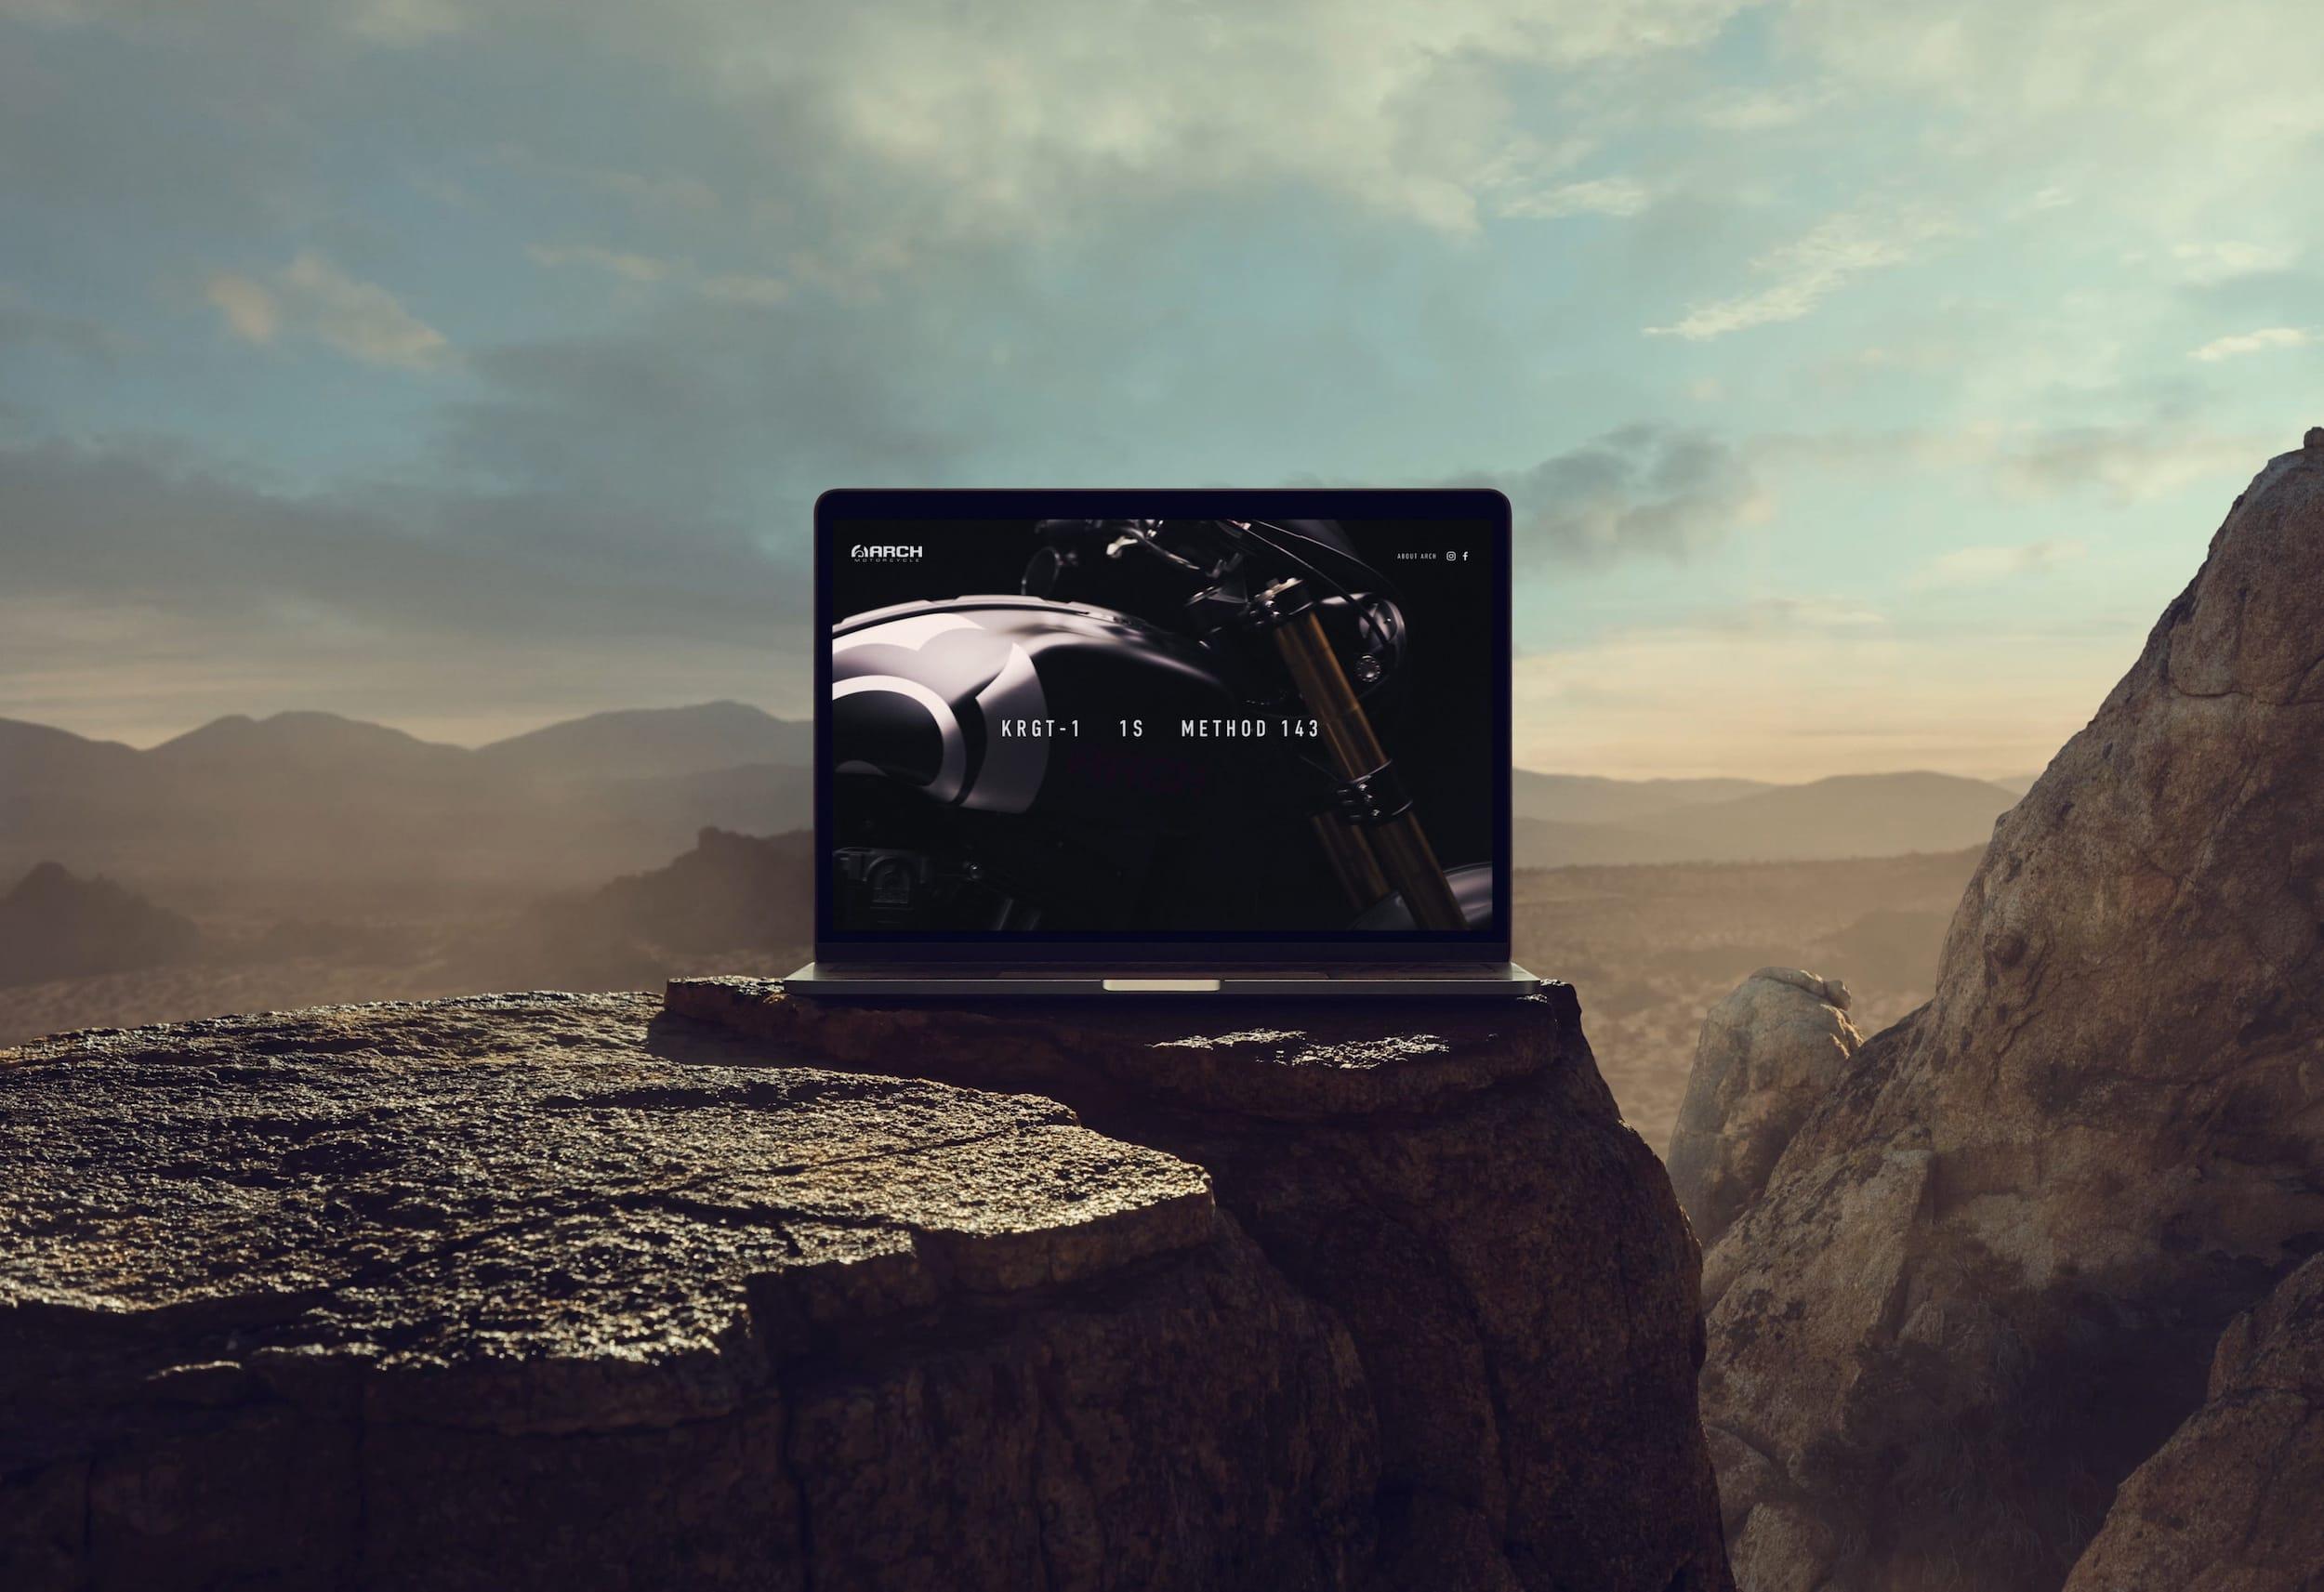 squarespace-content-management-system-desert-laptop.jpg